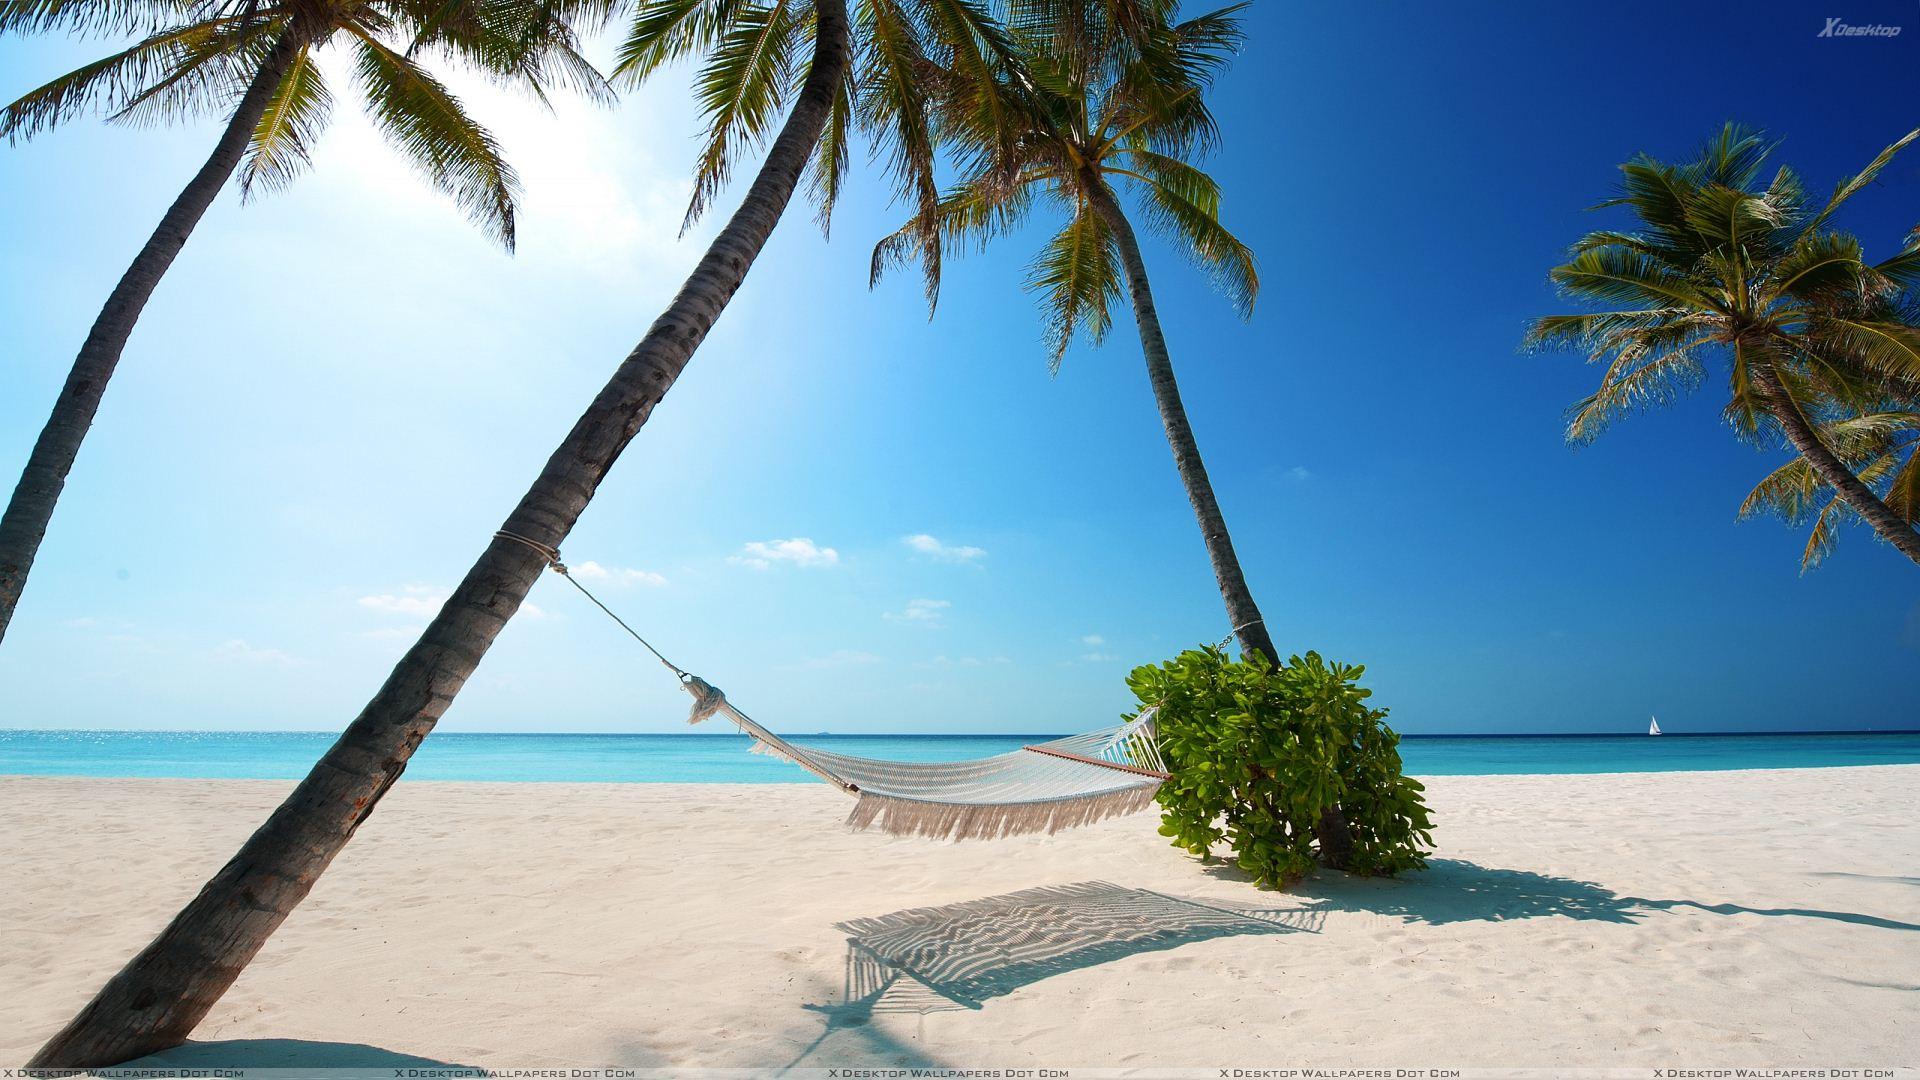 Maldives Islands Beach Scene Wallpaper